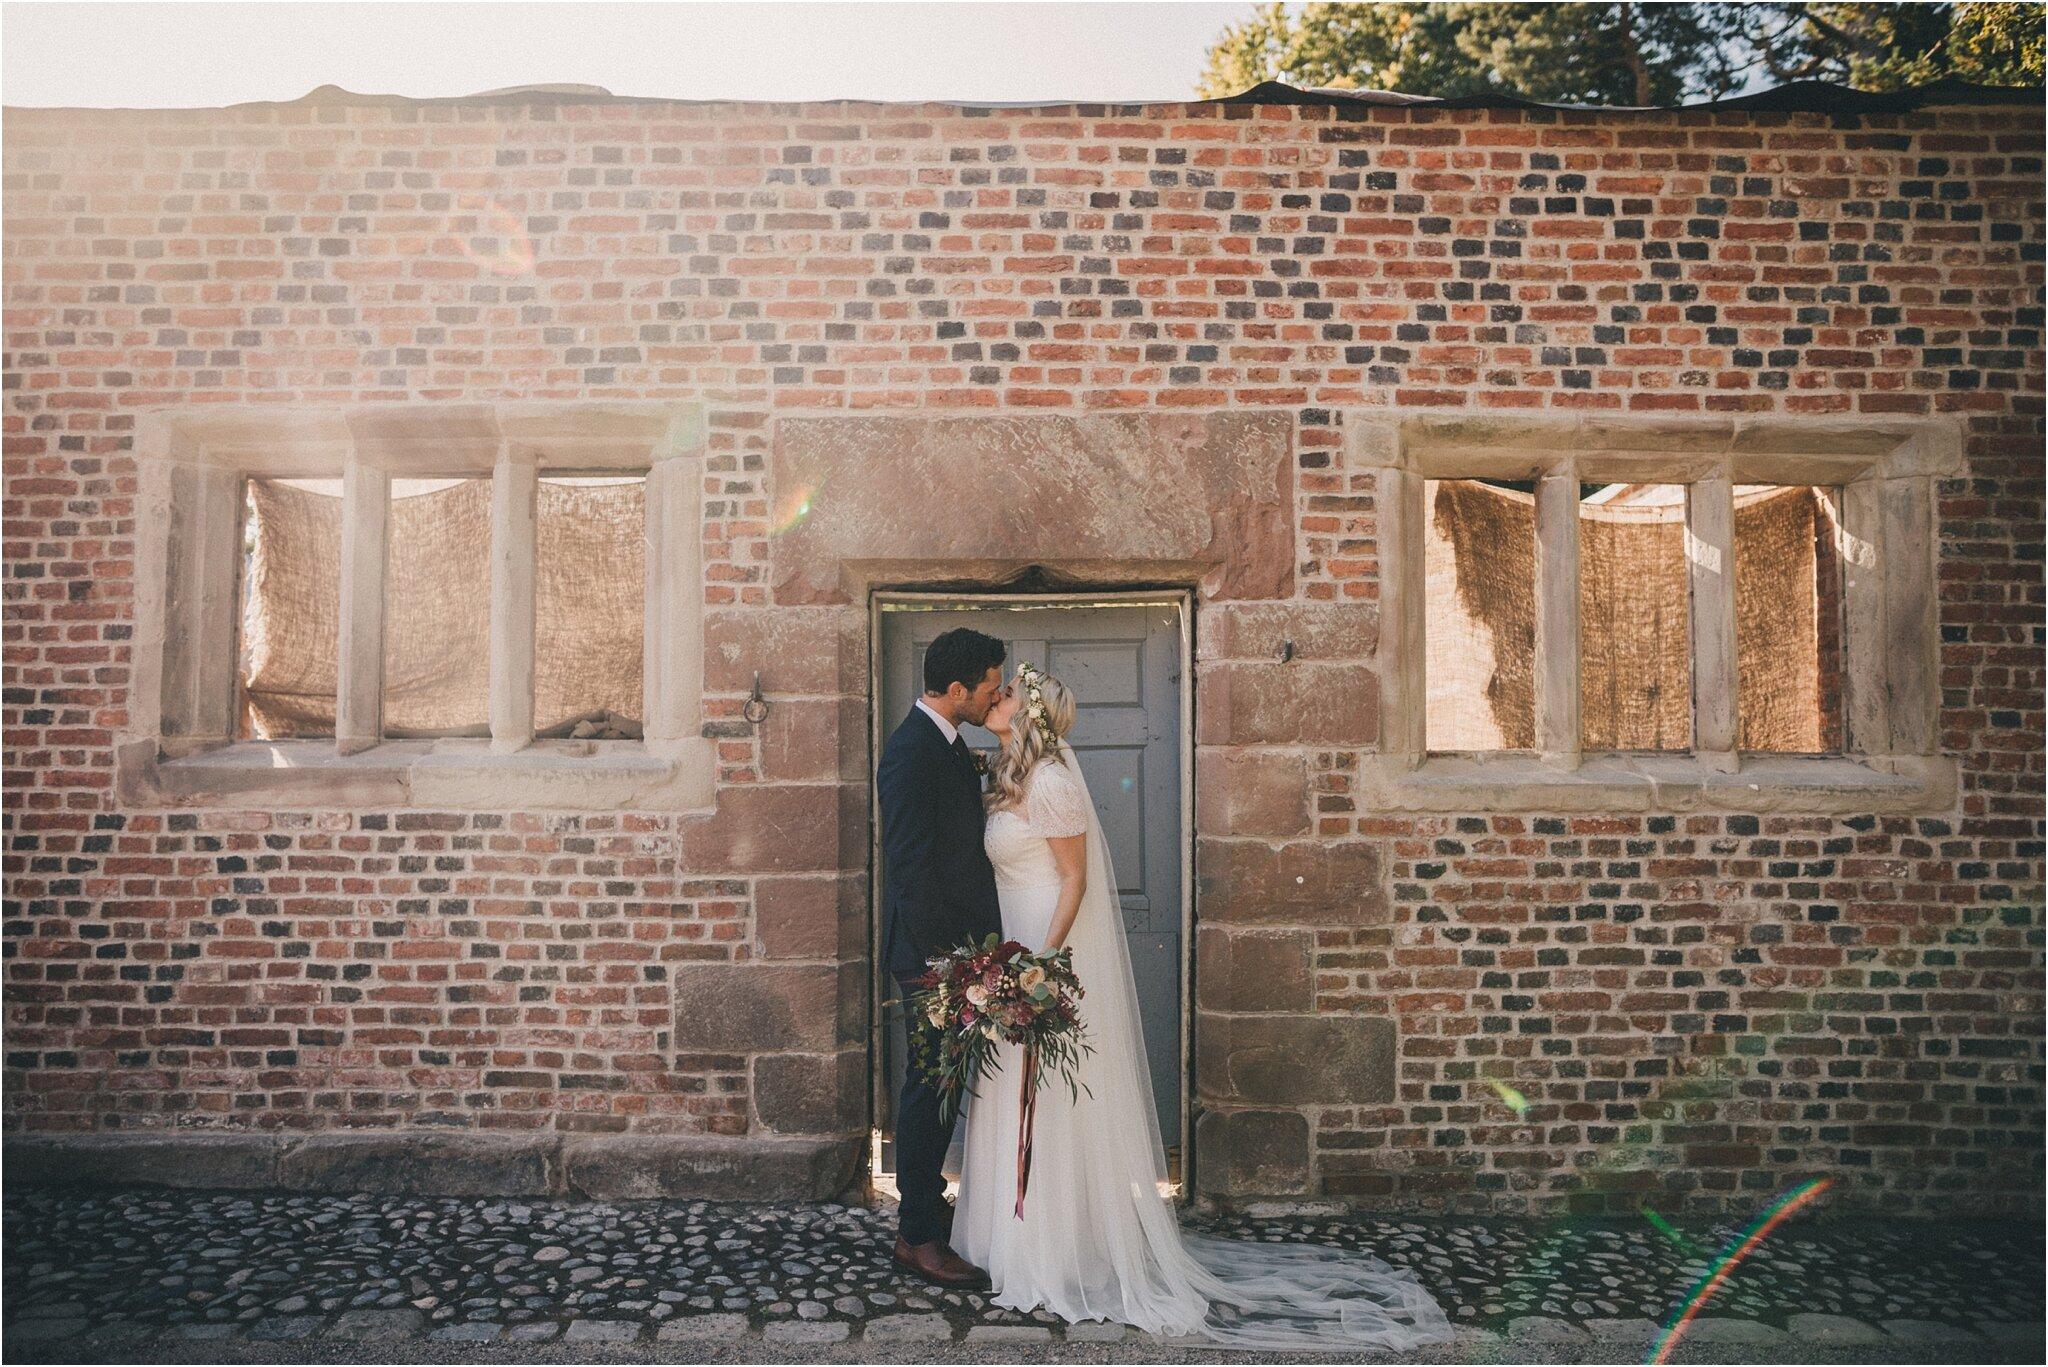 Dorfold Hall marquee wedding 00023.jpg